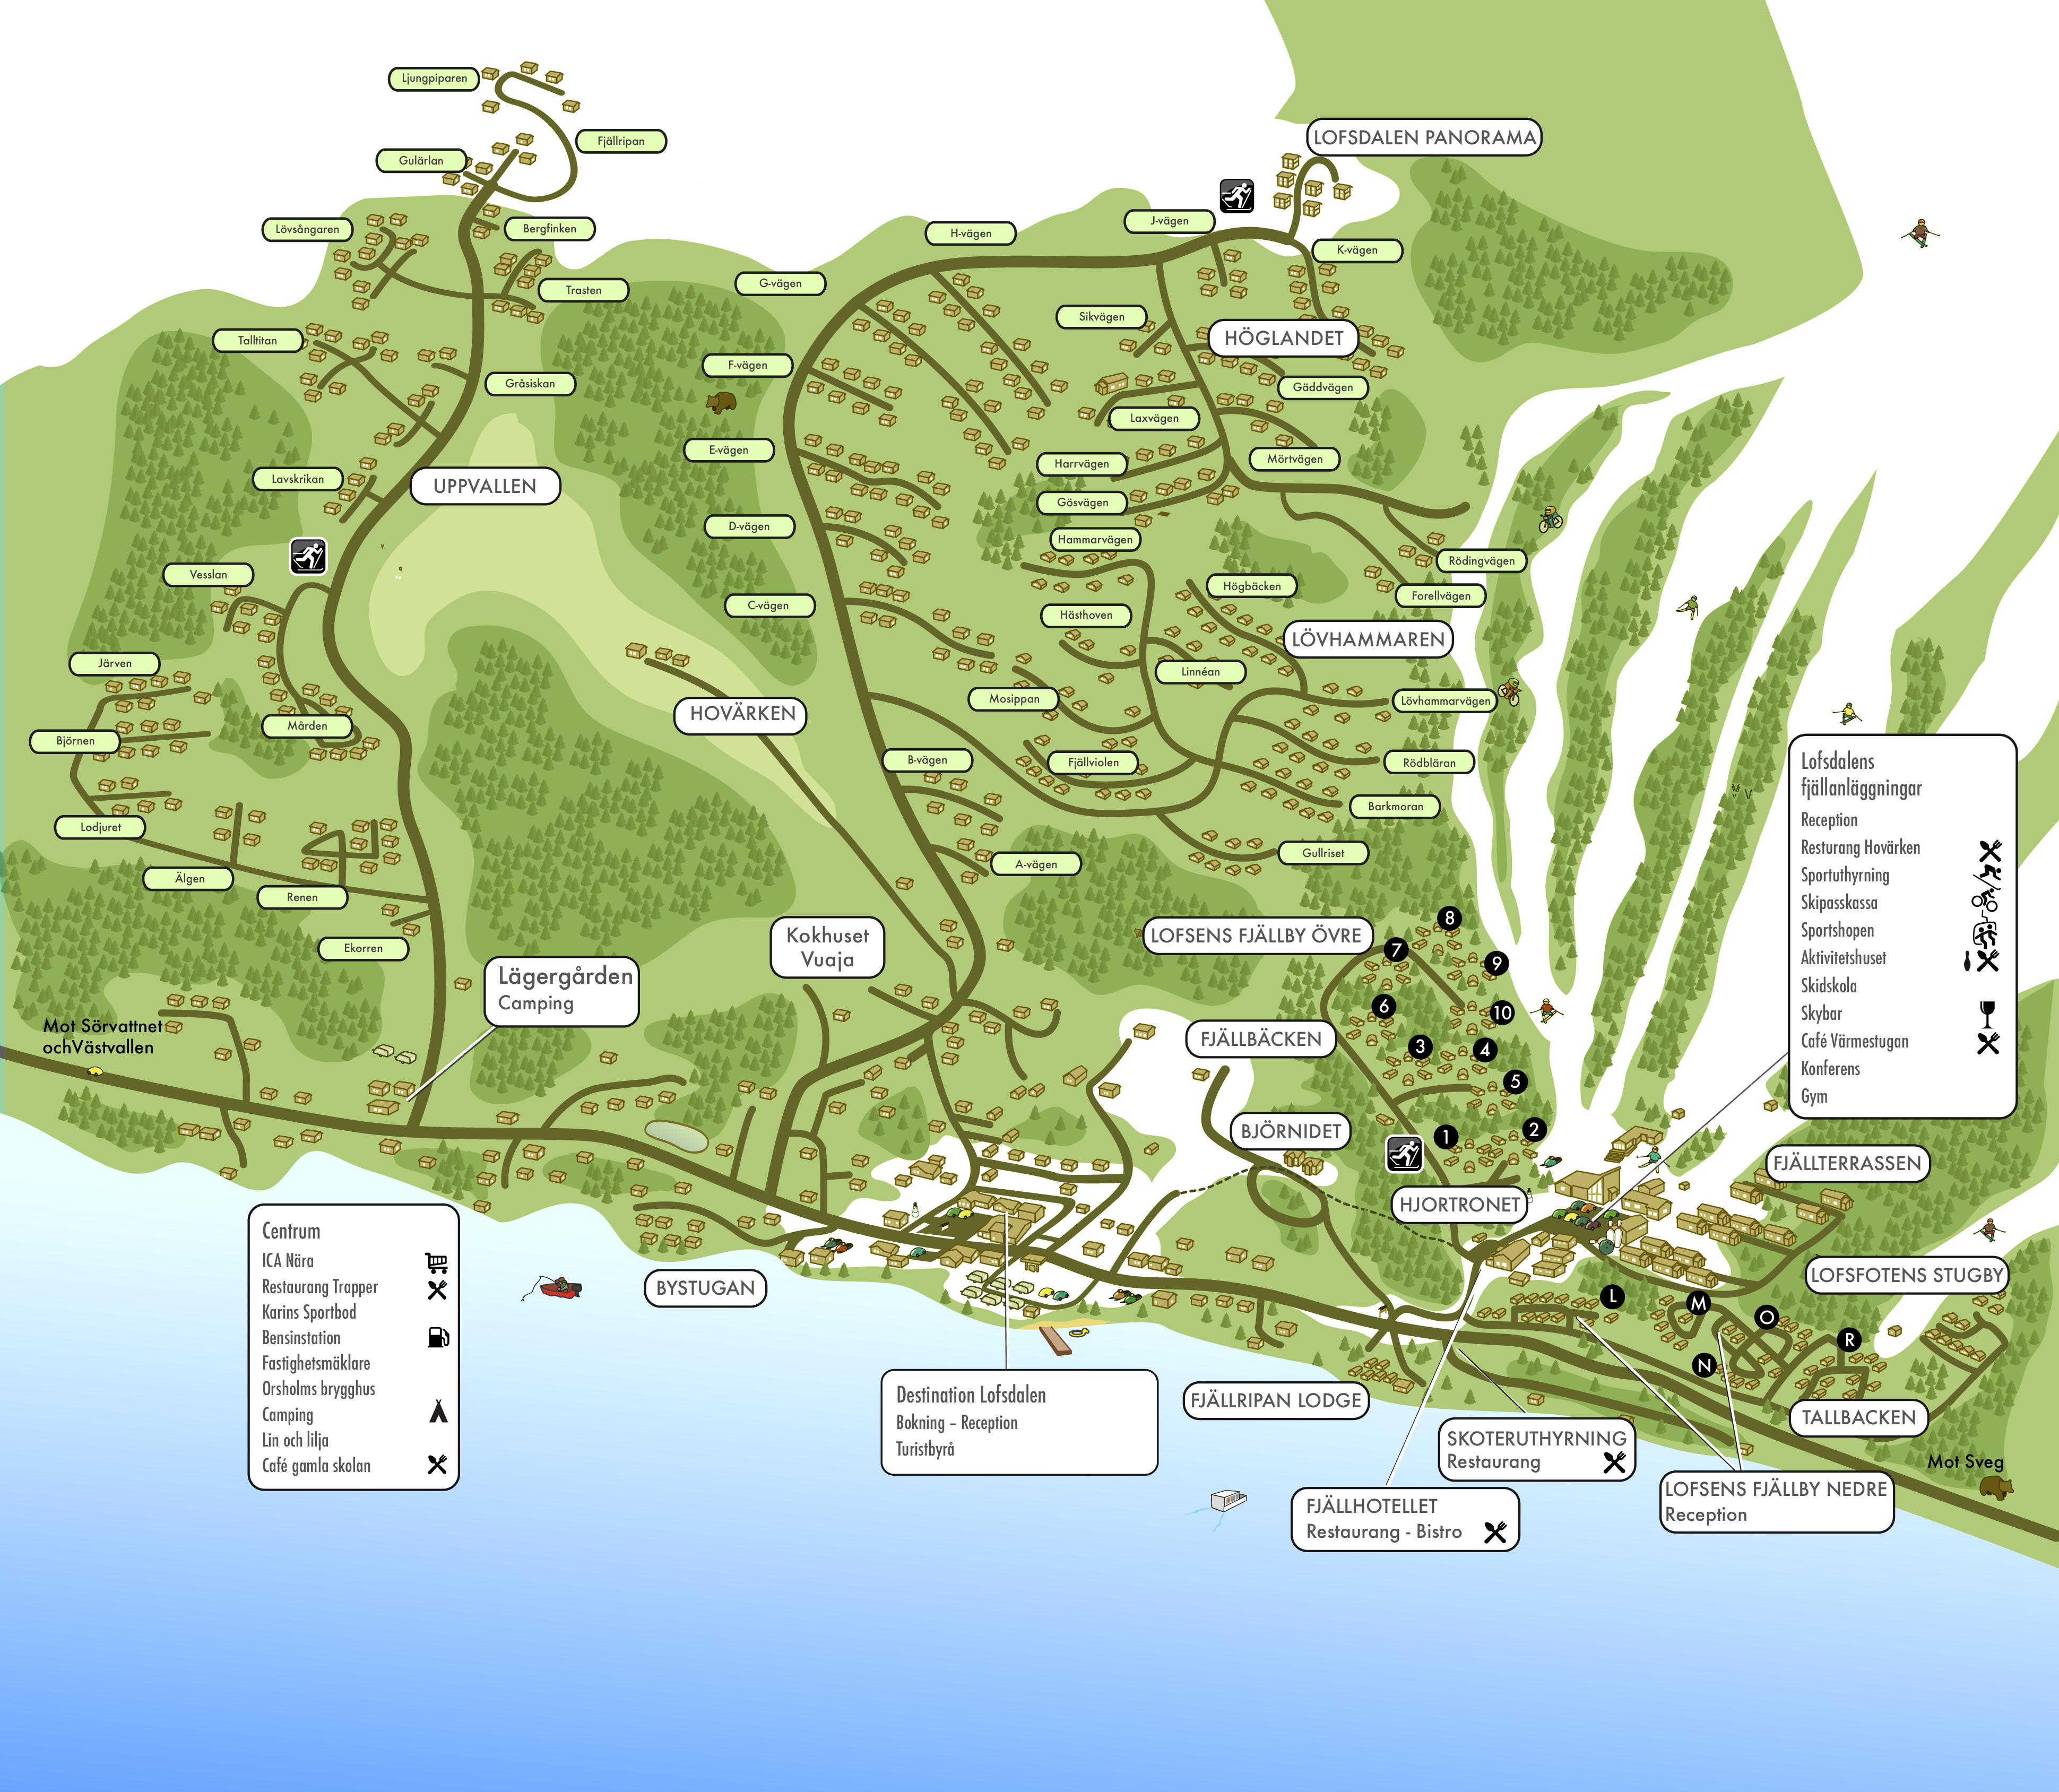 lofsdalen karta Områdeskarta | Lofsdalen lofsdalen karta